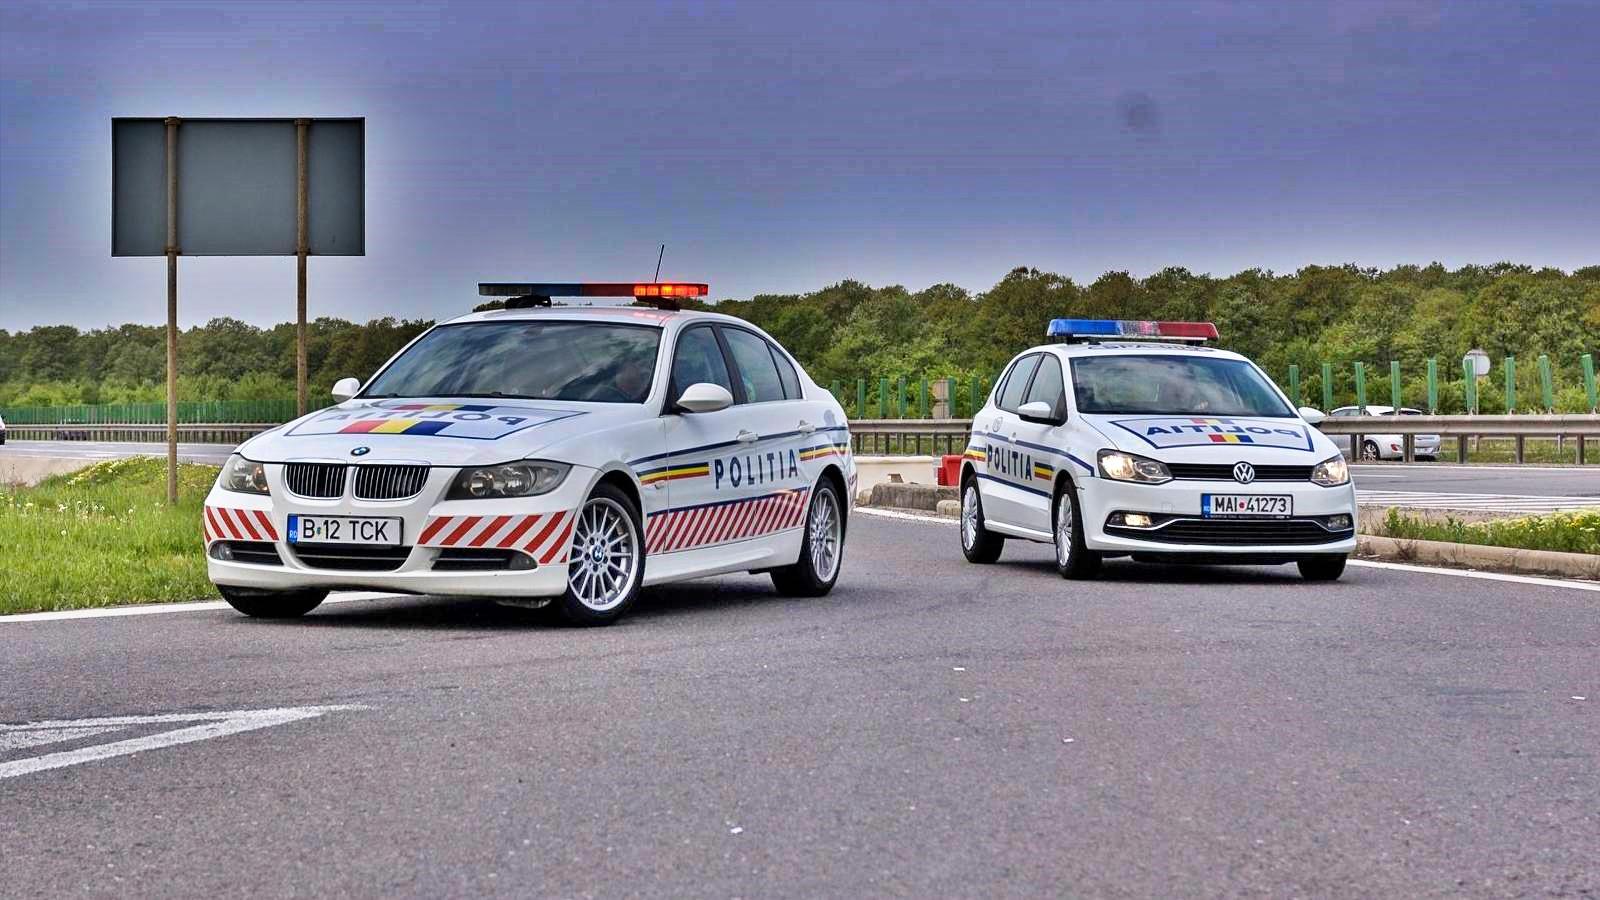 Politia Romana Avertismentul Vizeaza Soferii Romani